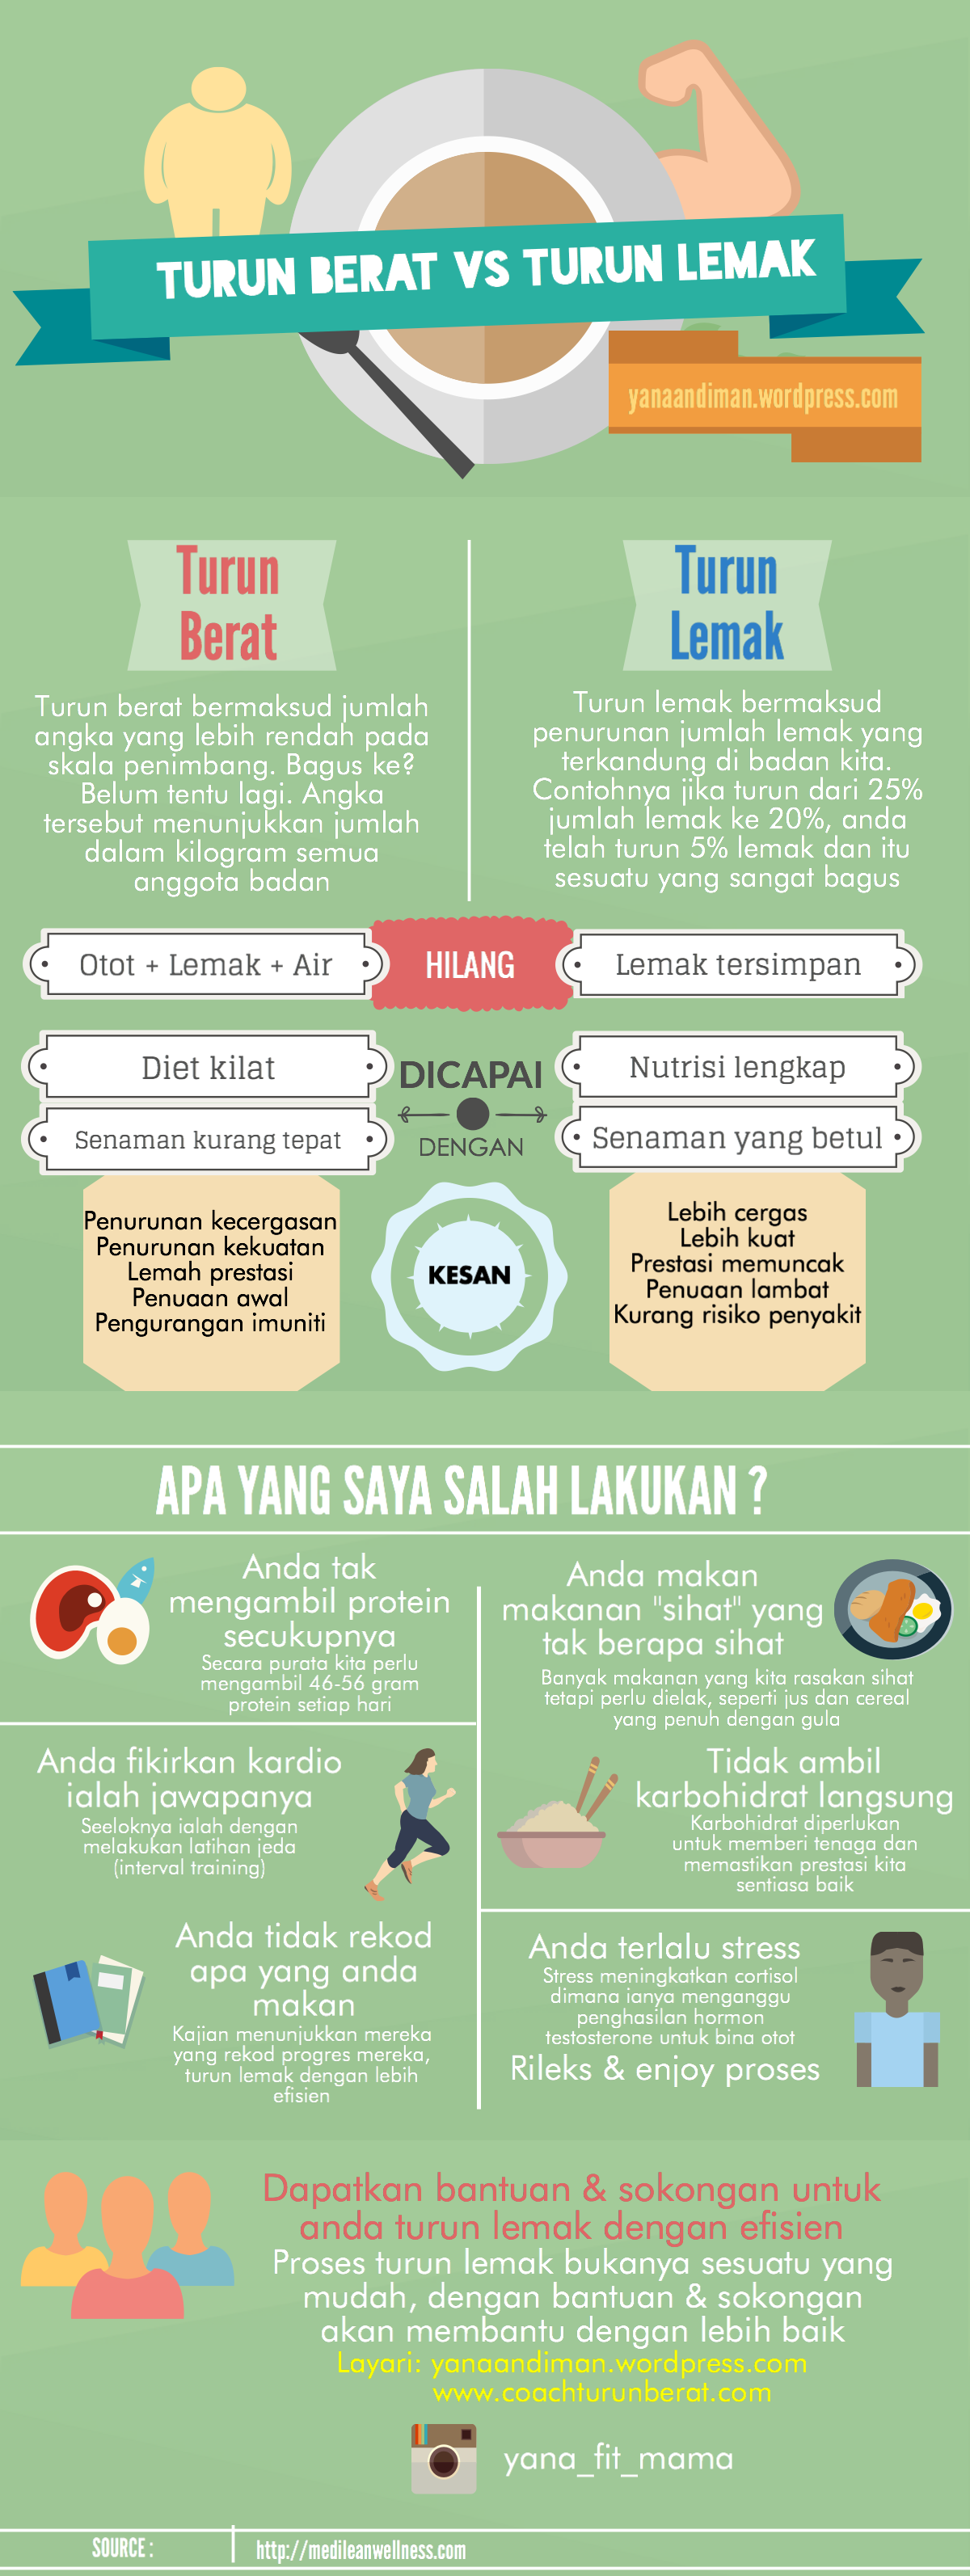 turun lemak vs berat infografik